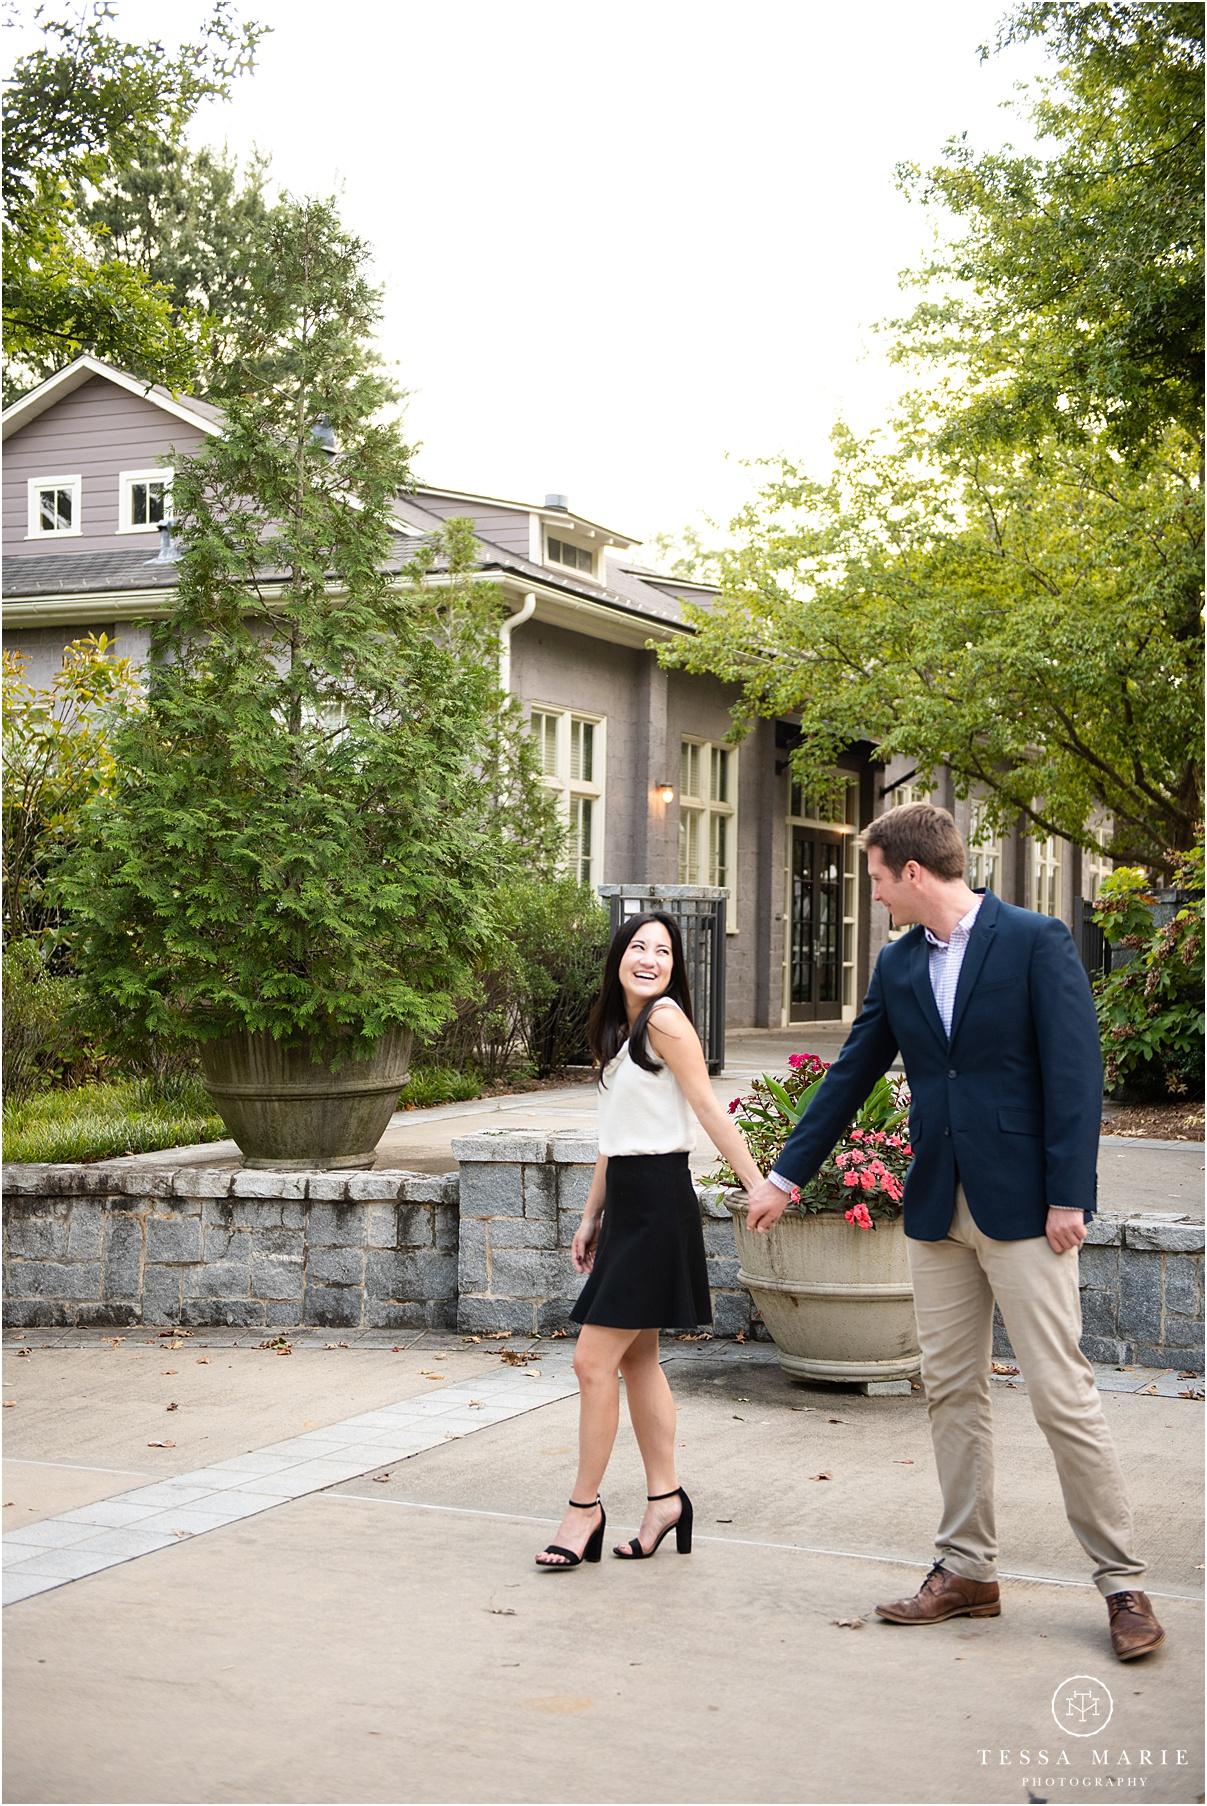 Tessa_marie_photography_wedding_photographer_engagement_pictures_piedmont_park_0061.jpg